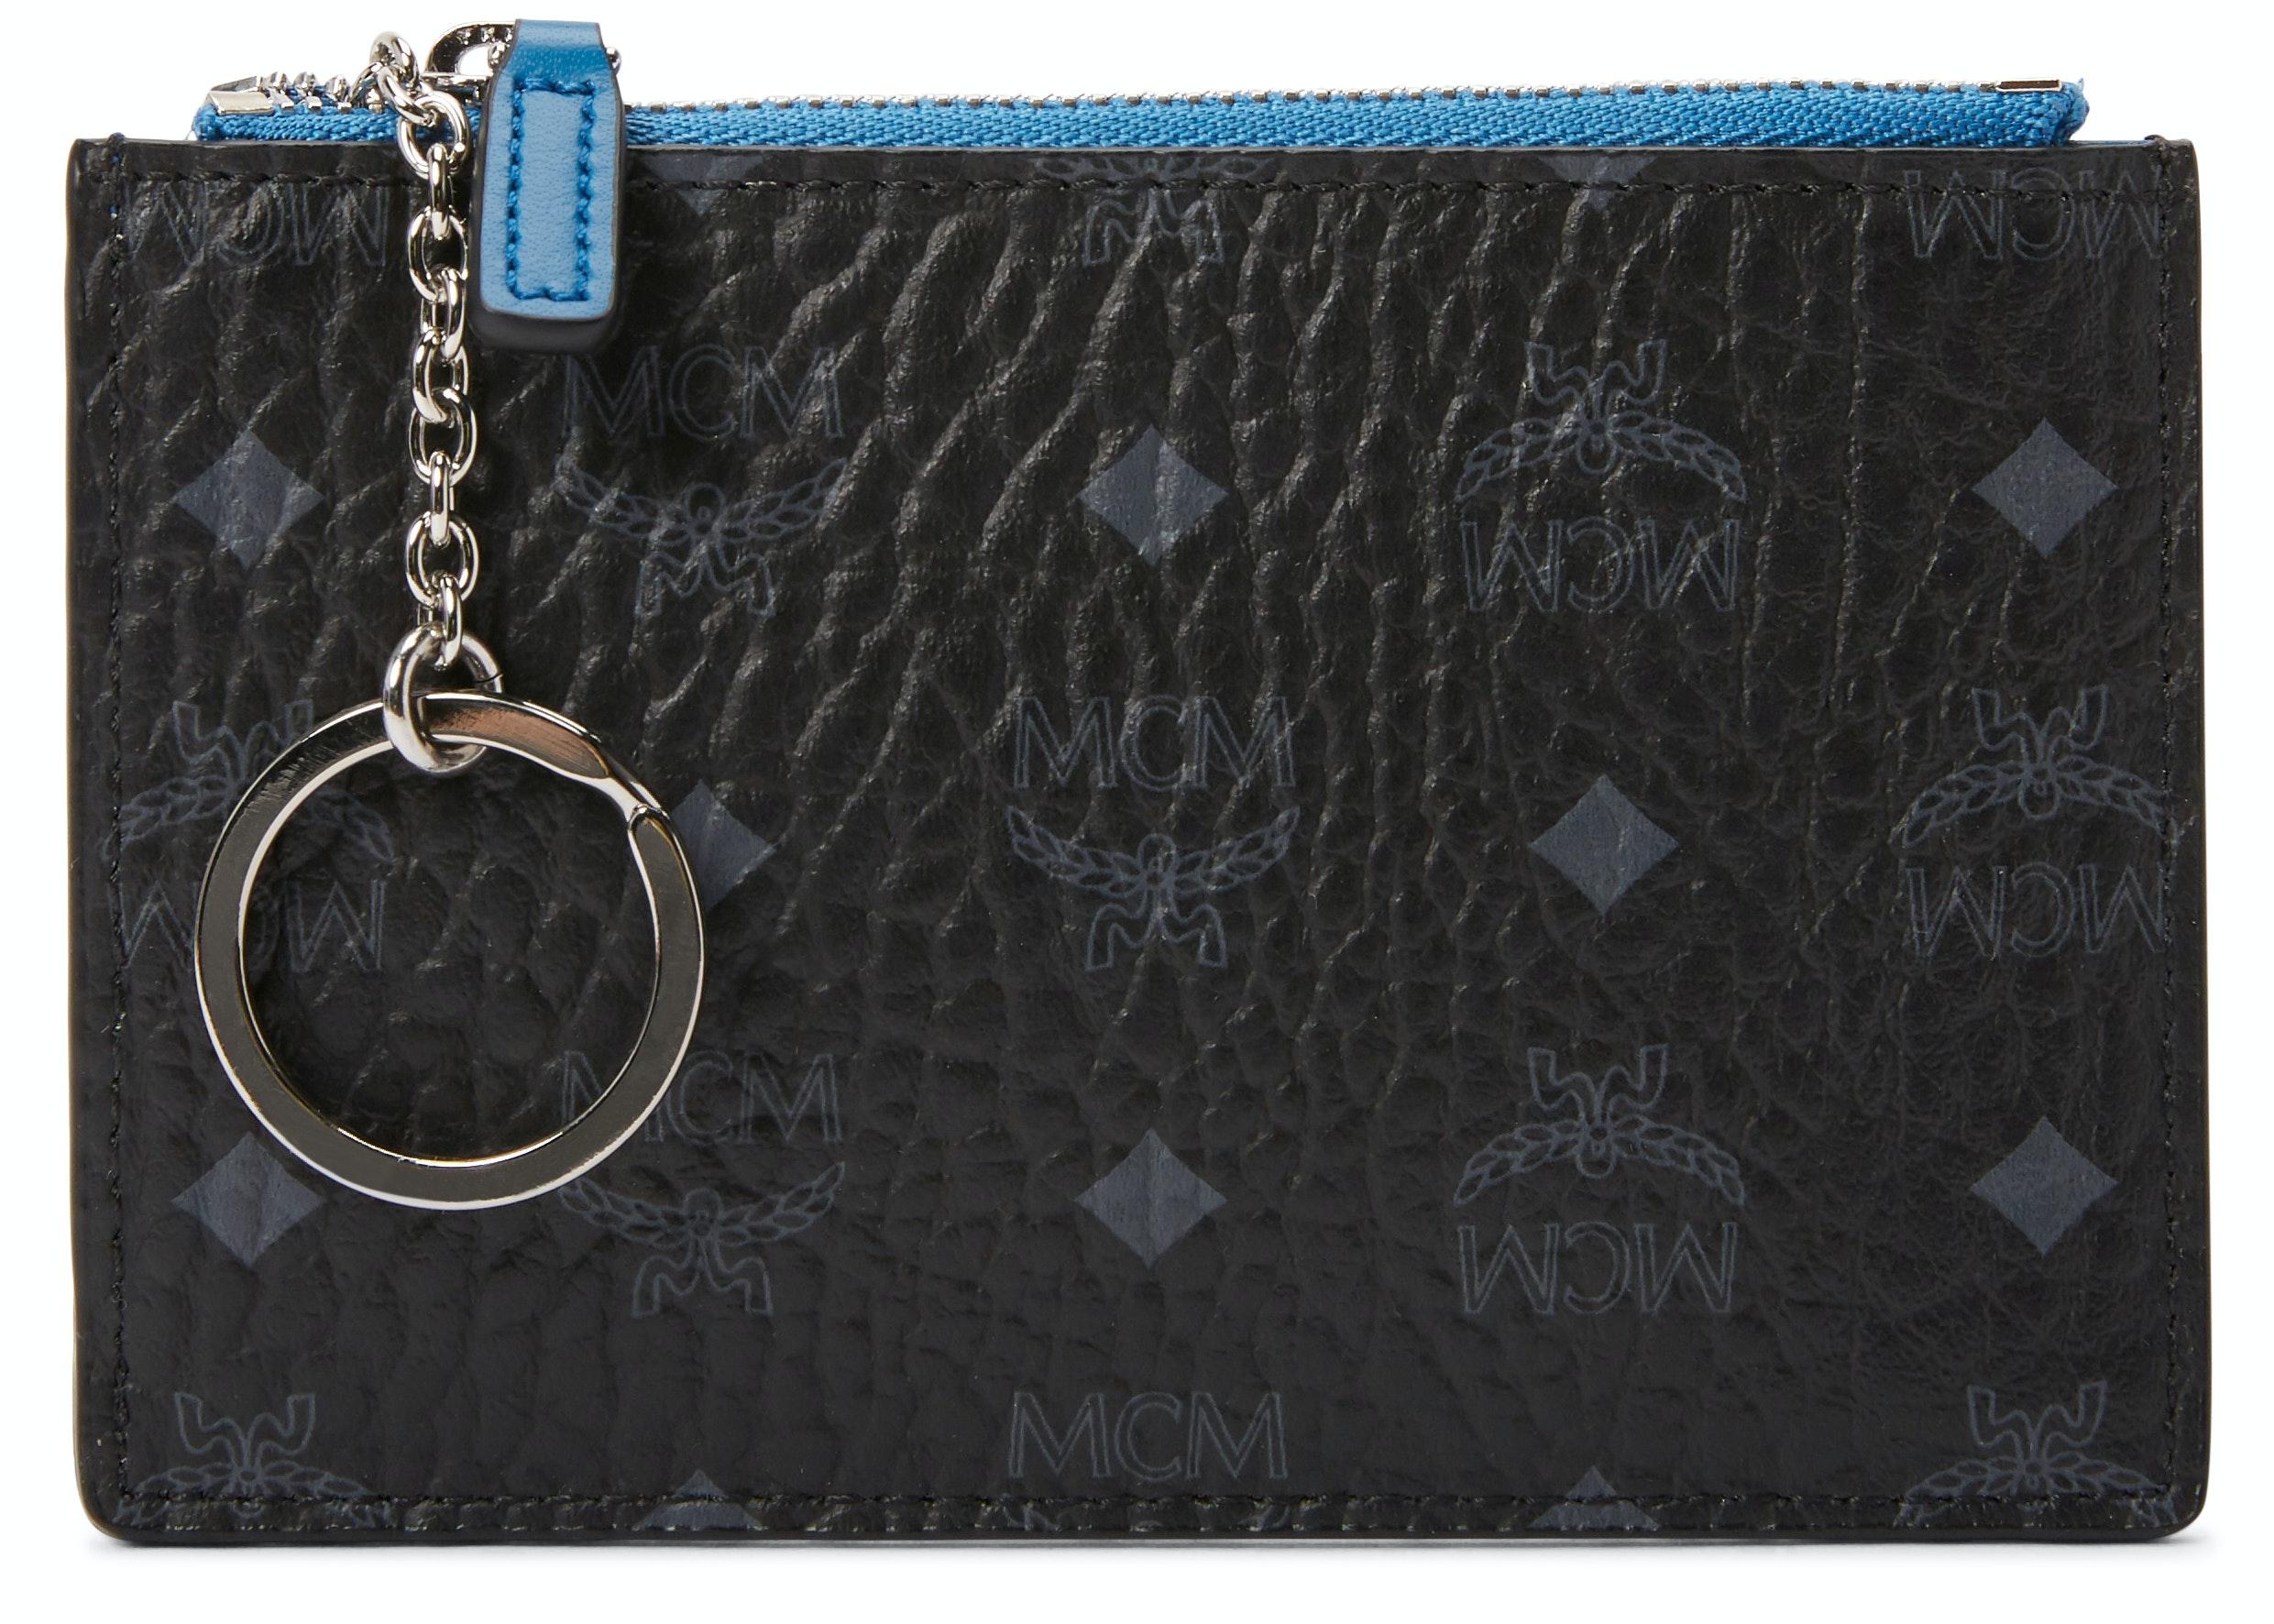 MCM Key Pouch Visetos Blue Contrast Small Black